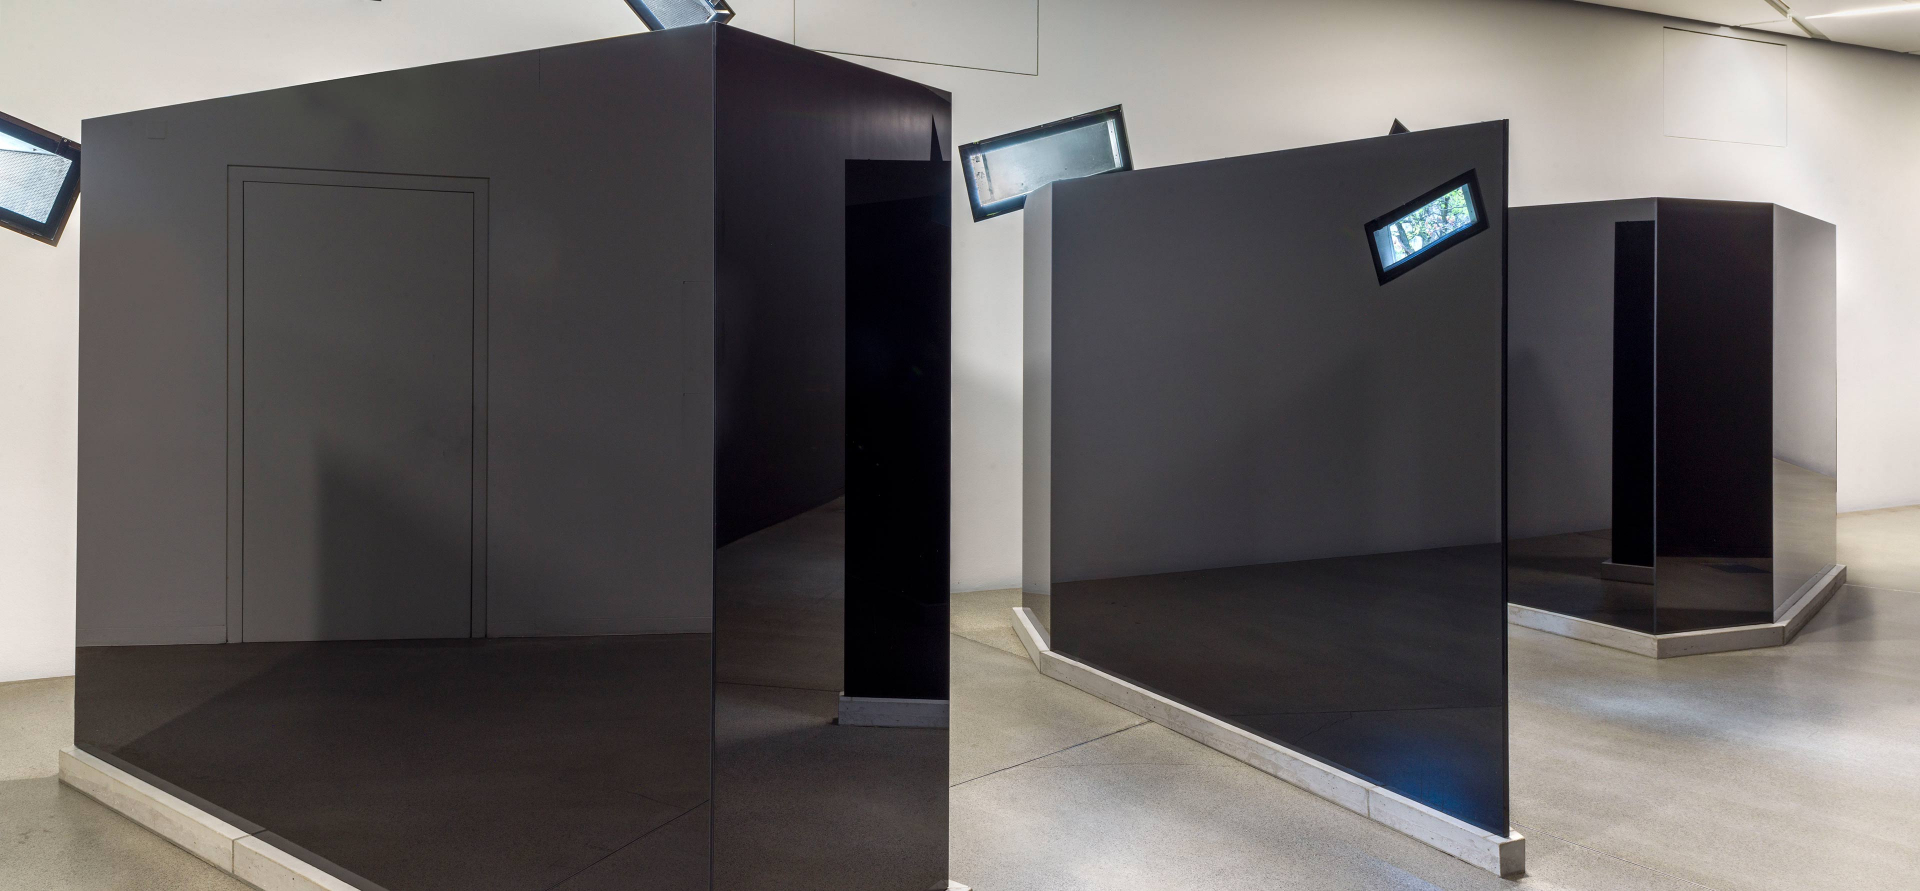 Three trapezoidal black-glass sculptures